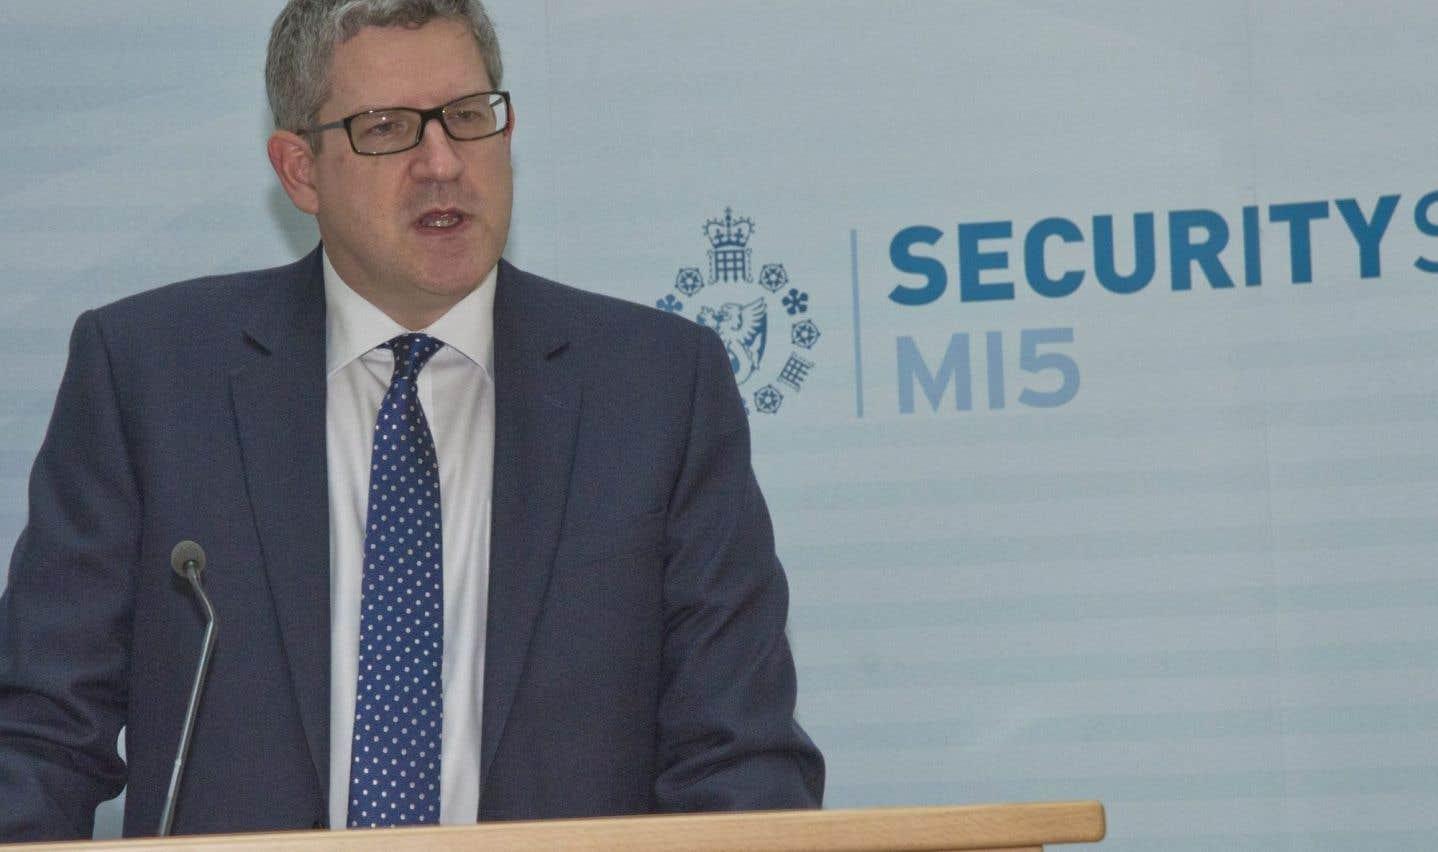 L'espionnage britannique met en garde contre une Russie «agressive»